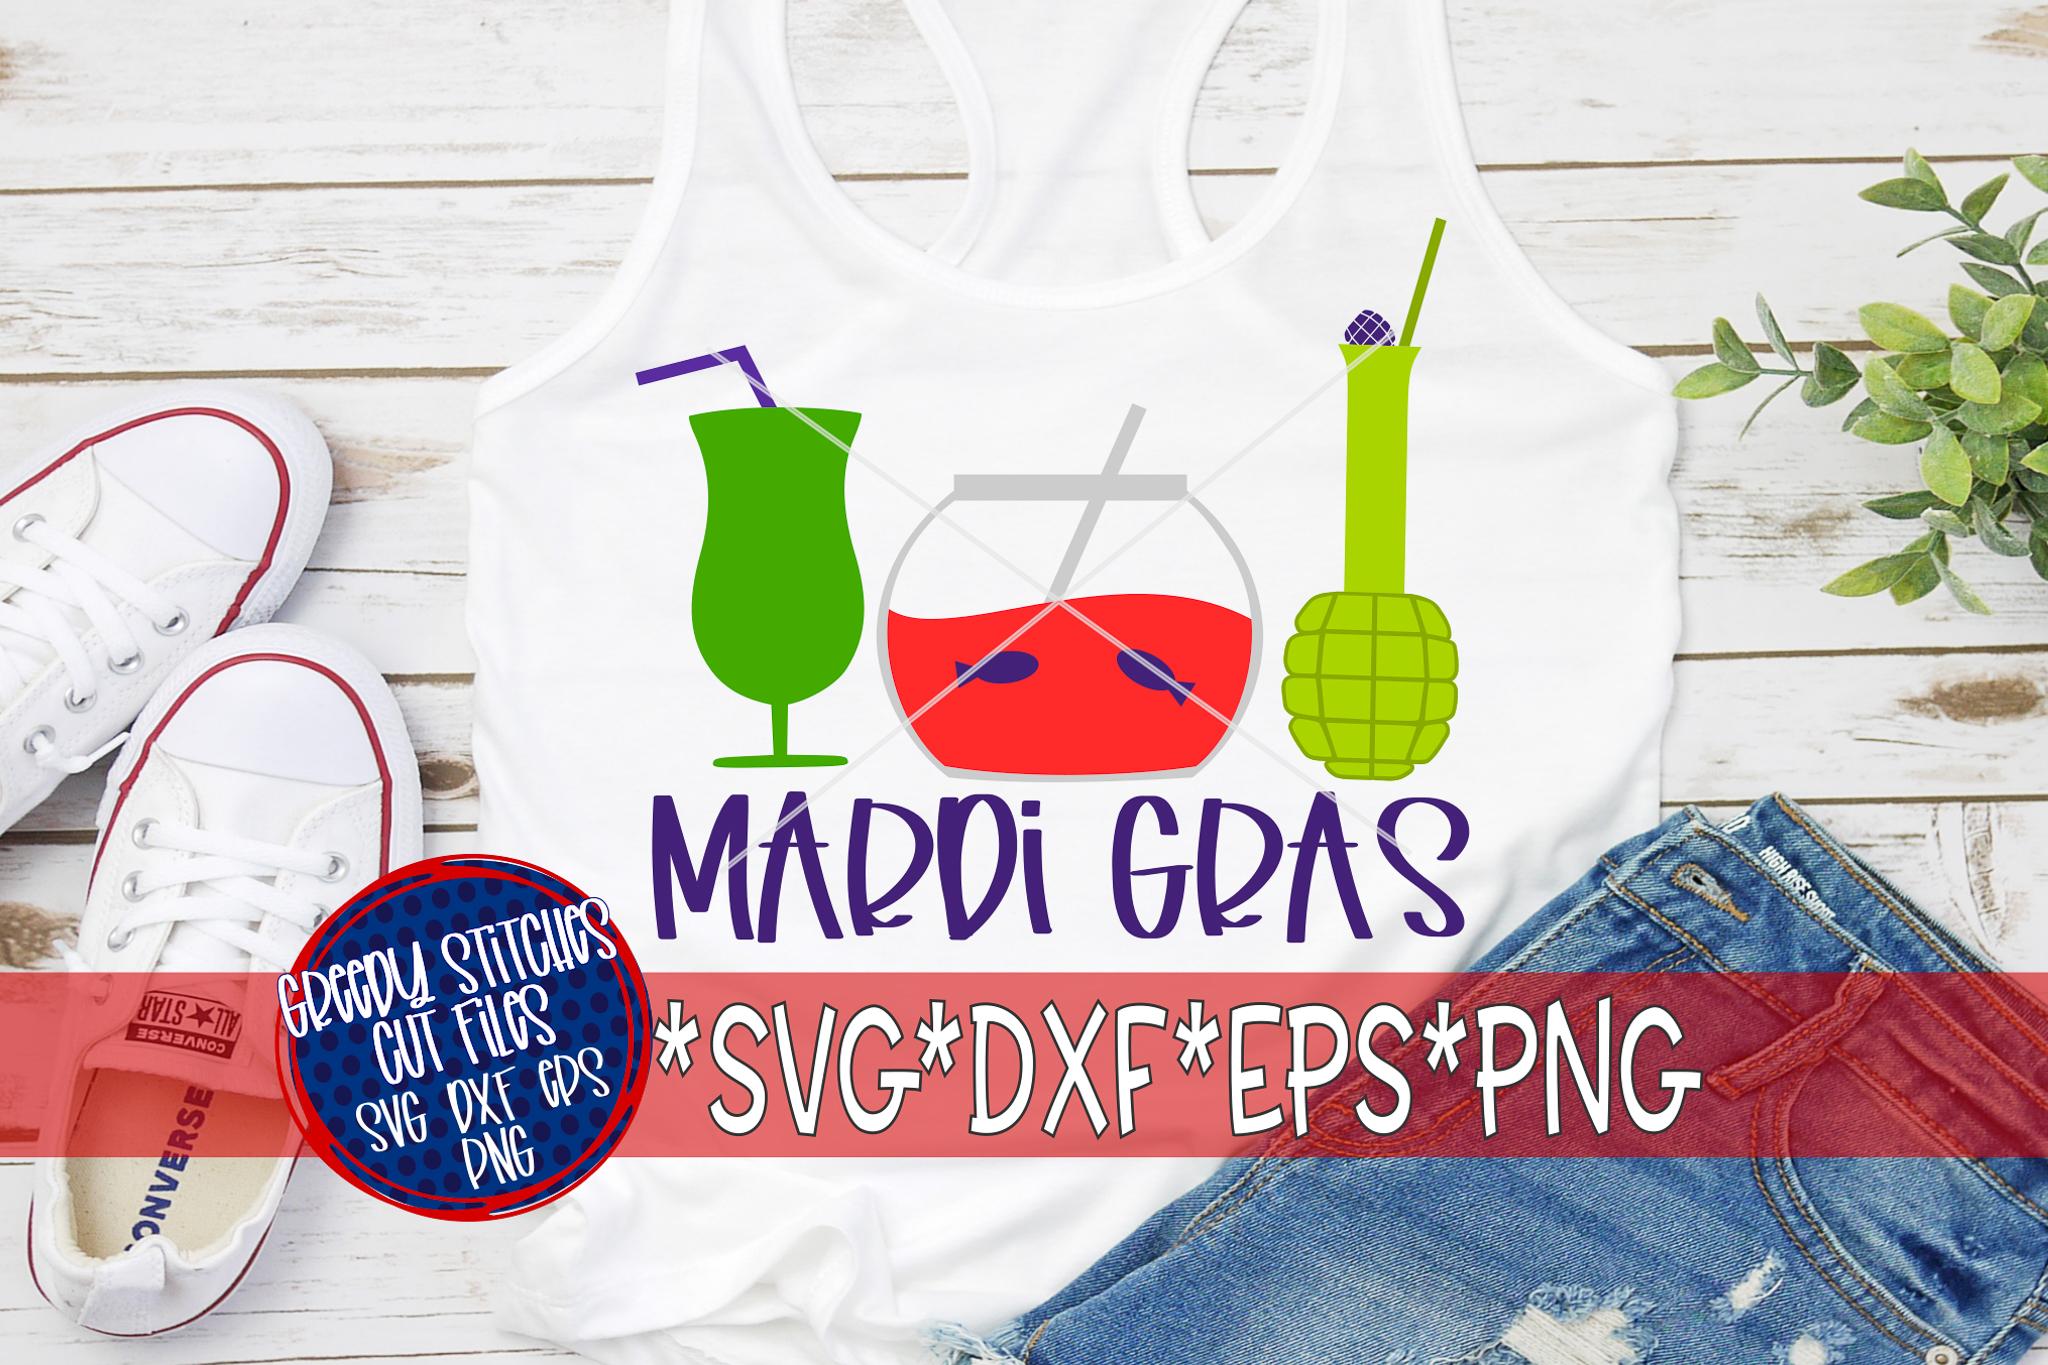 Mardi Gras |Mardi Gras Drinks SVG DXF EPS PNG example image 2